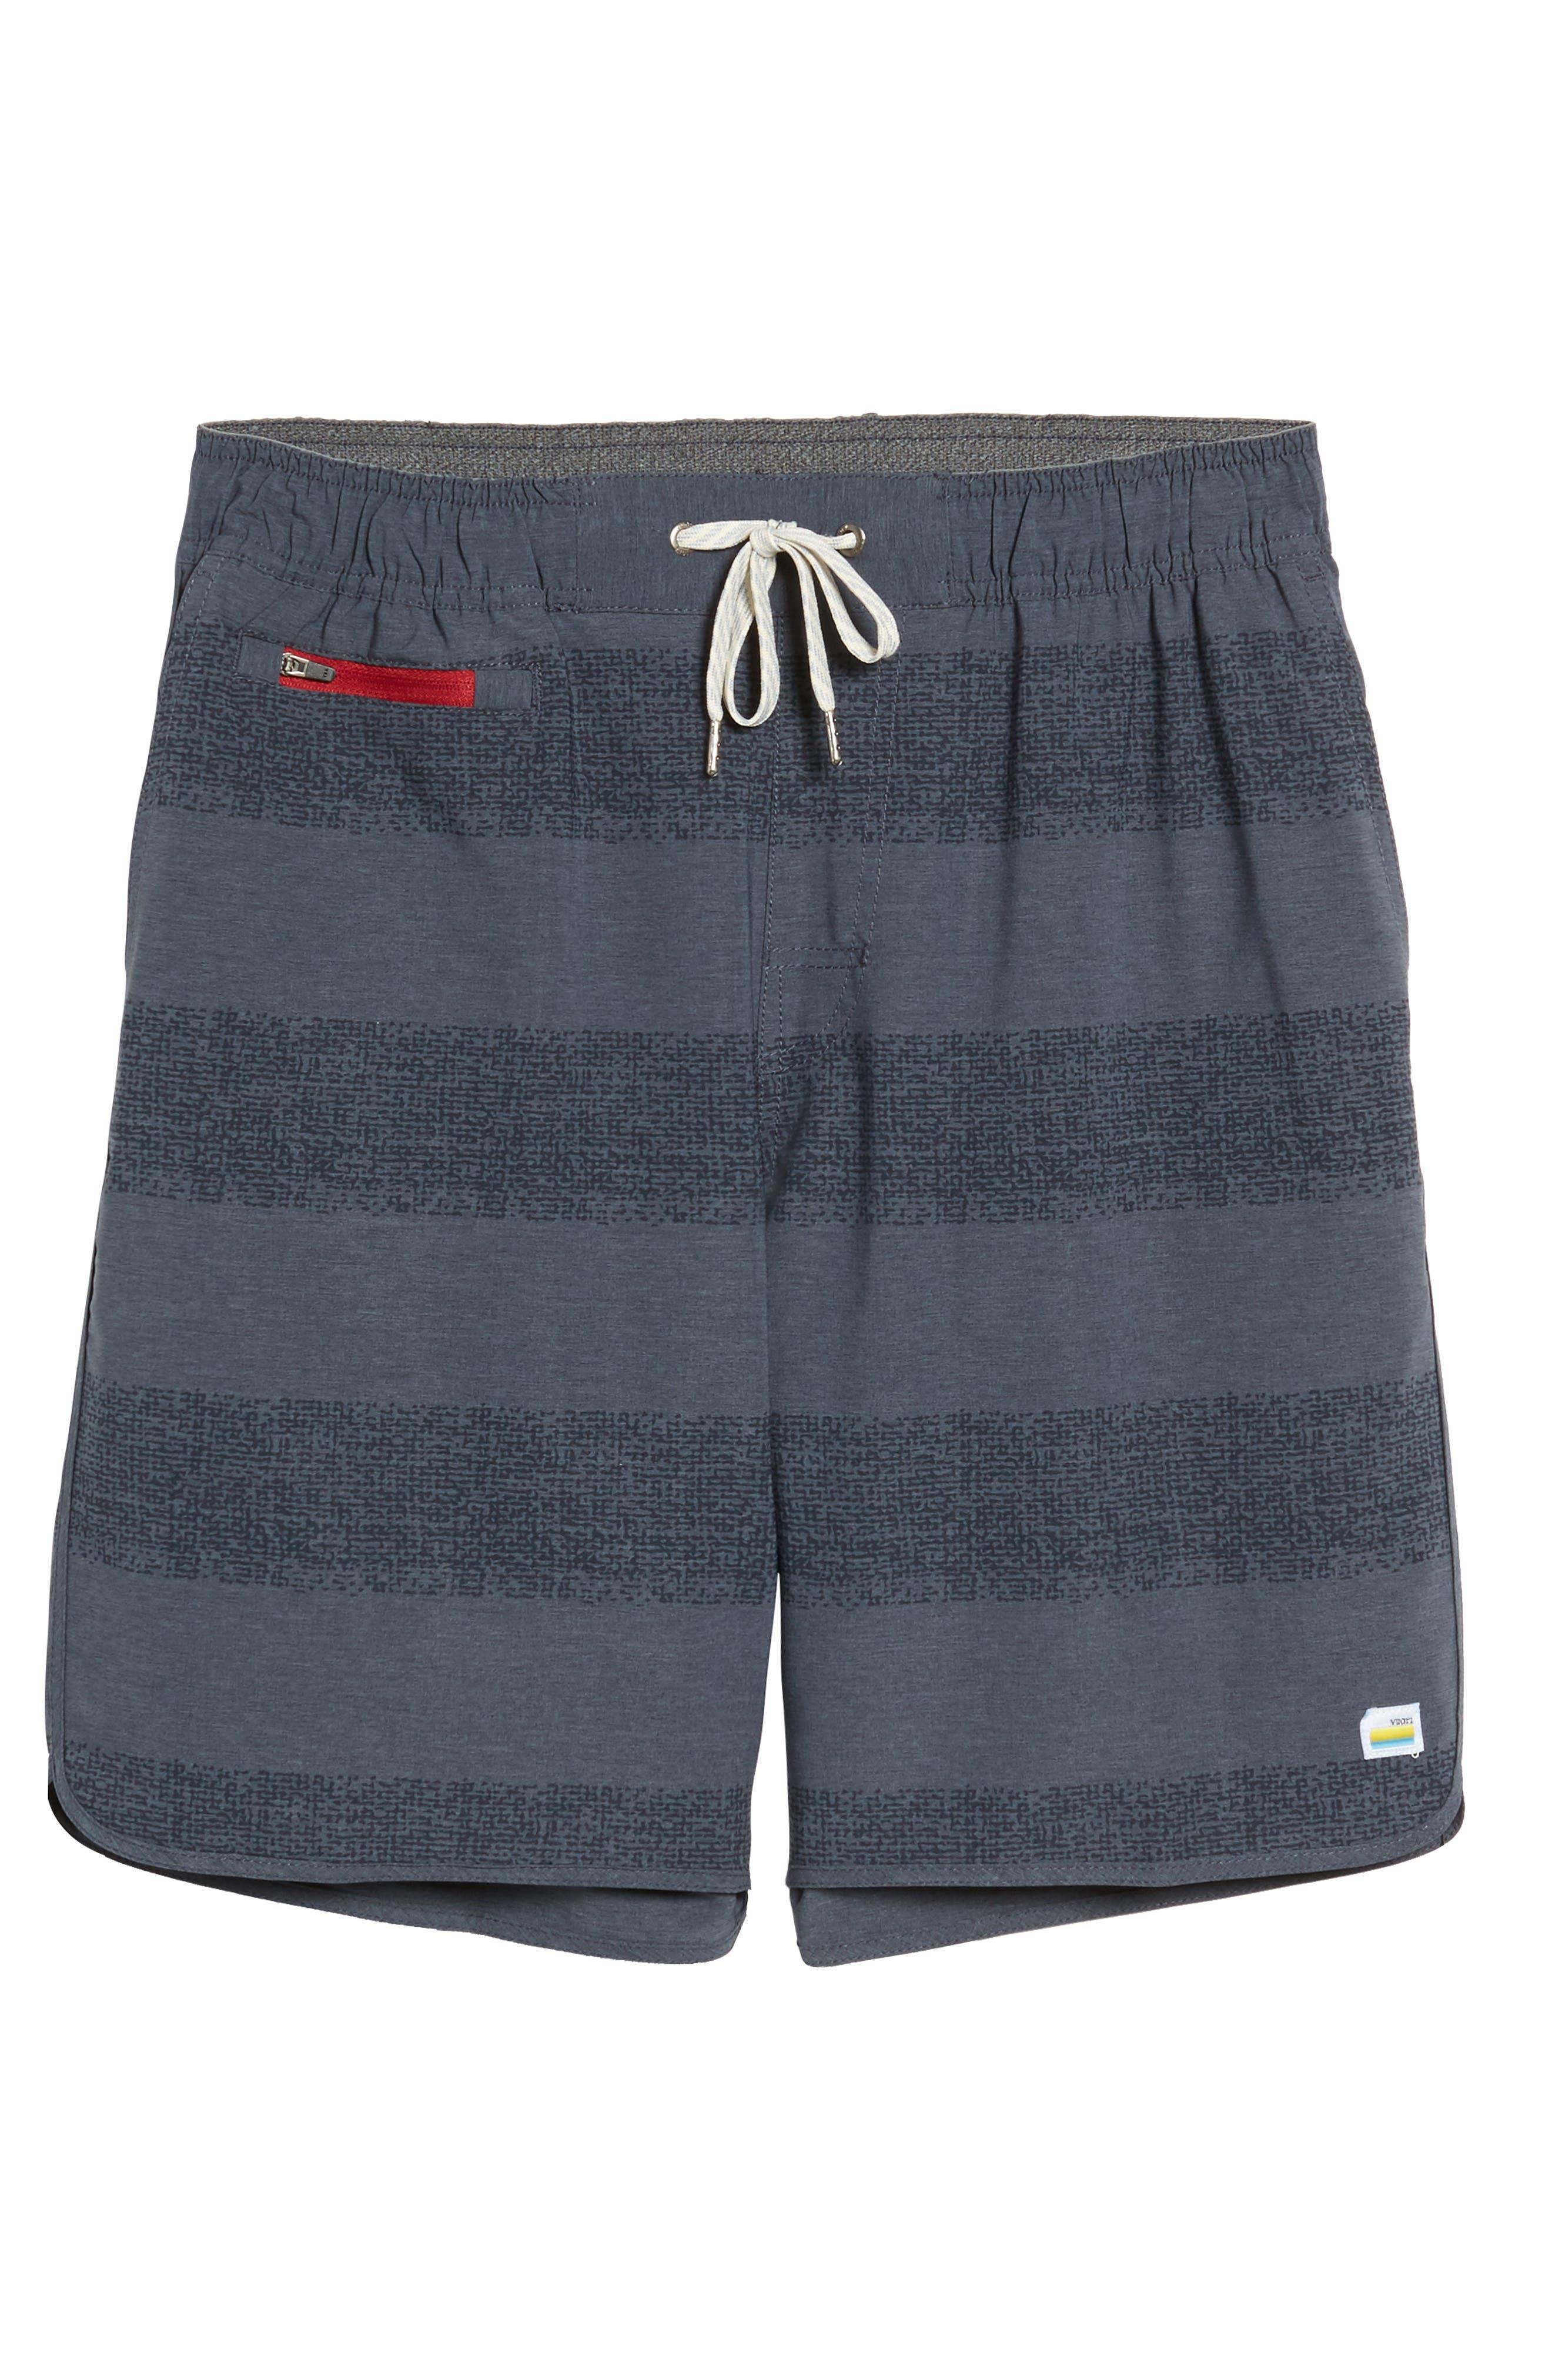 Banks Shorts,                             Alternate thumbnail 6, color,                             415